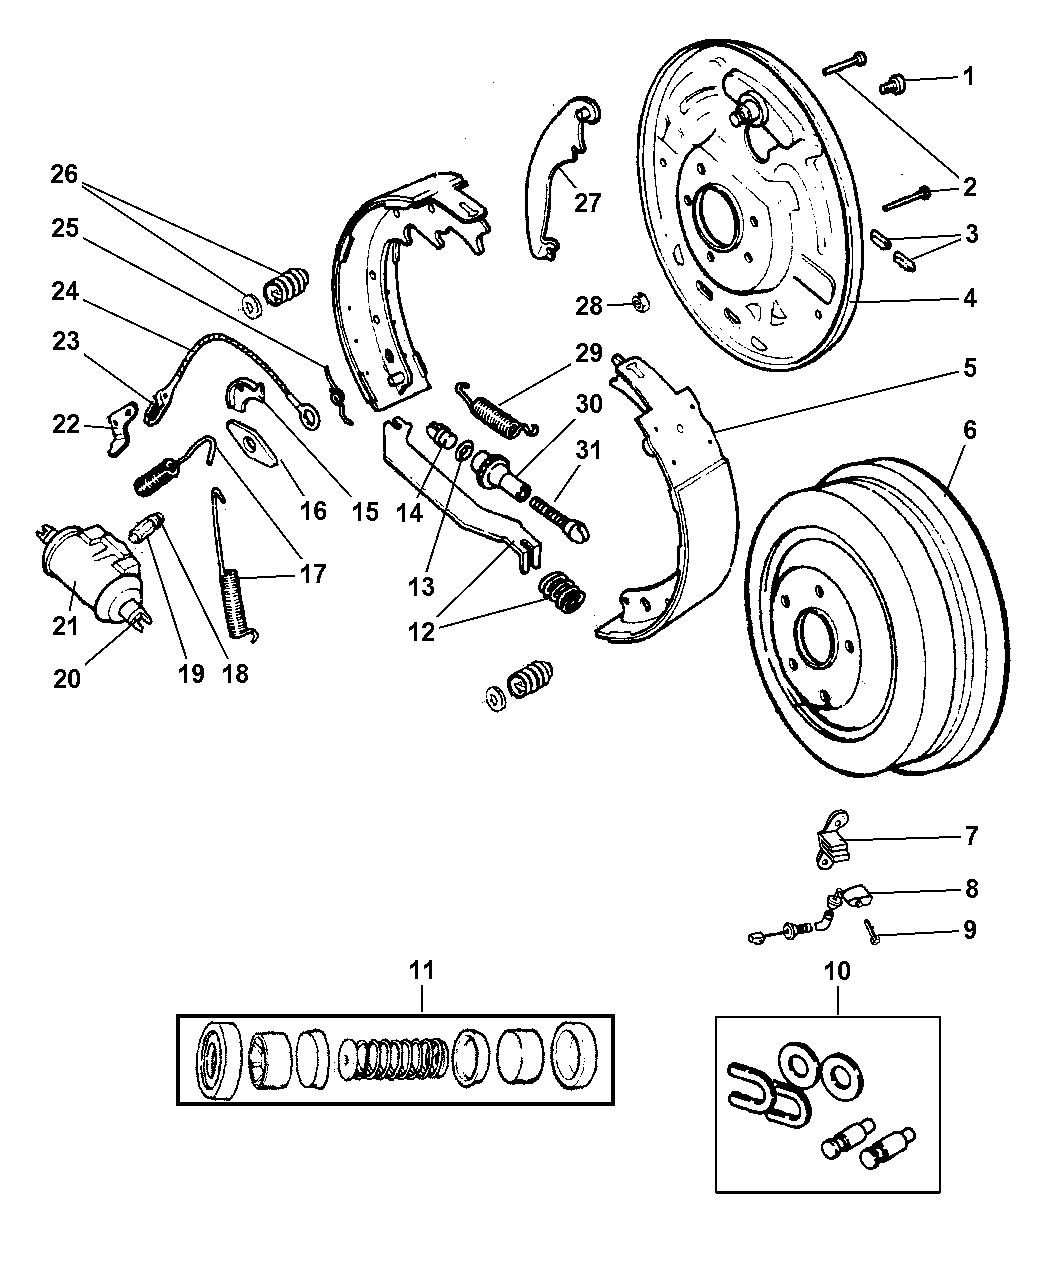 1999 jeep wrangler rear drum brakes mopar parts giant Harley Rear Drum Brake Diagram